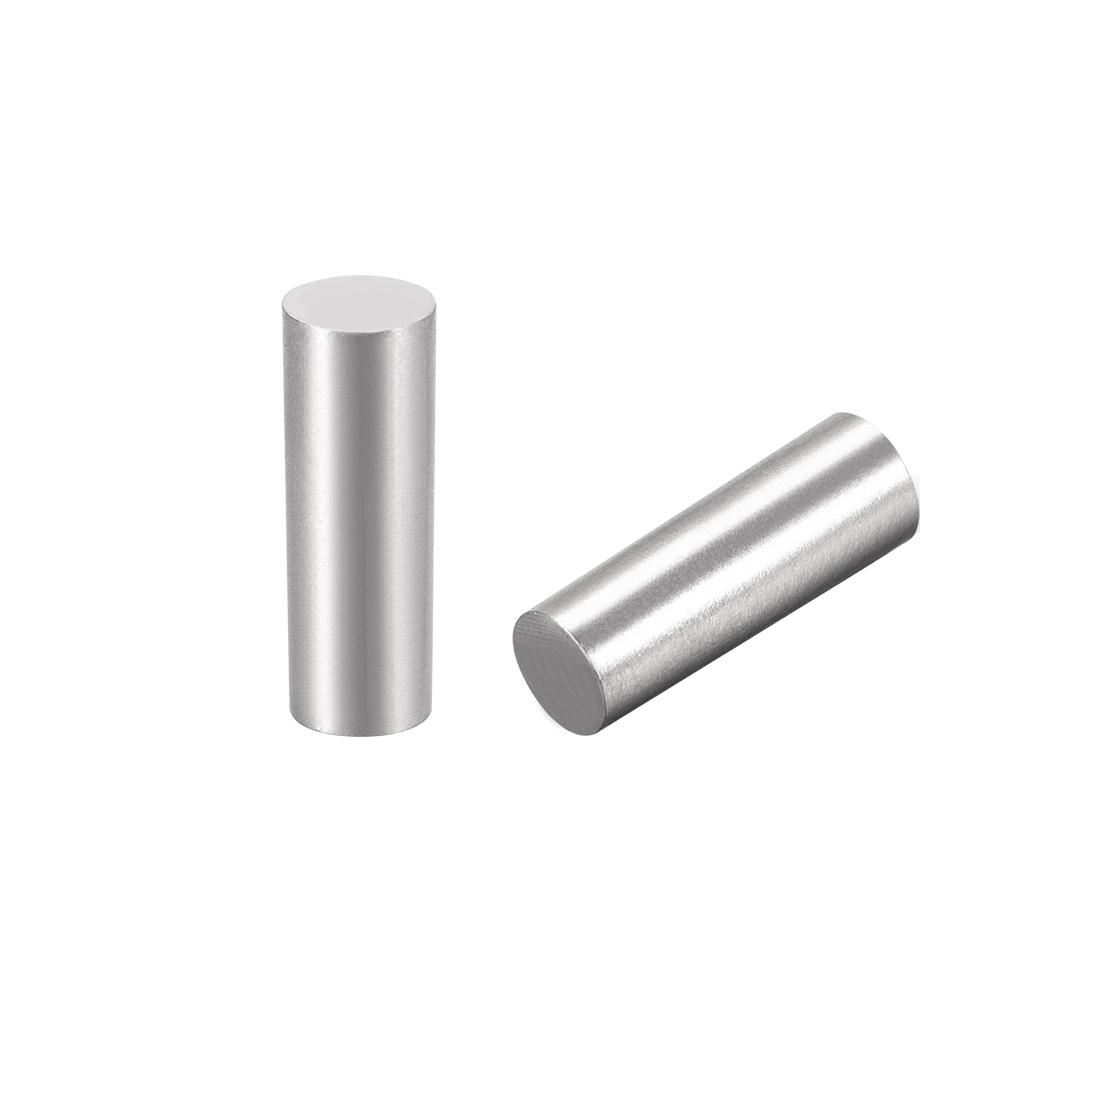 2Pcs 4mm x 12mm 1:50 Taper Pin 304 Stainless Steel Shelf Support Pin Fasten